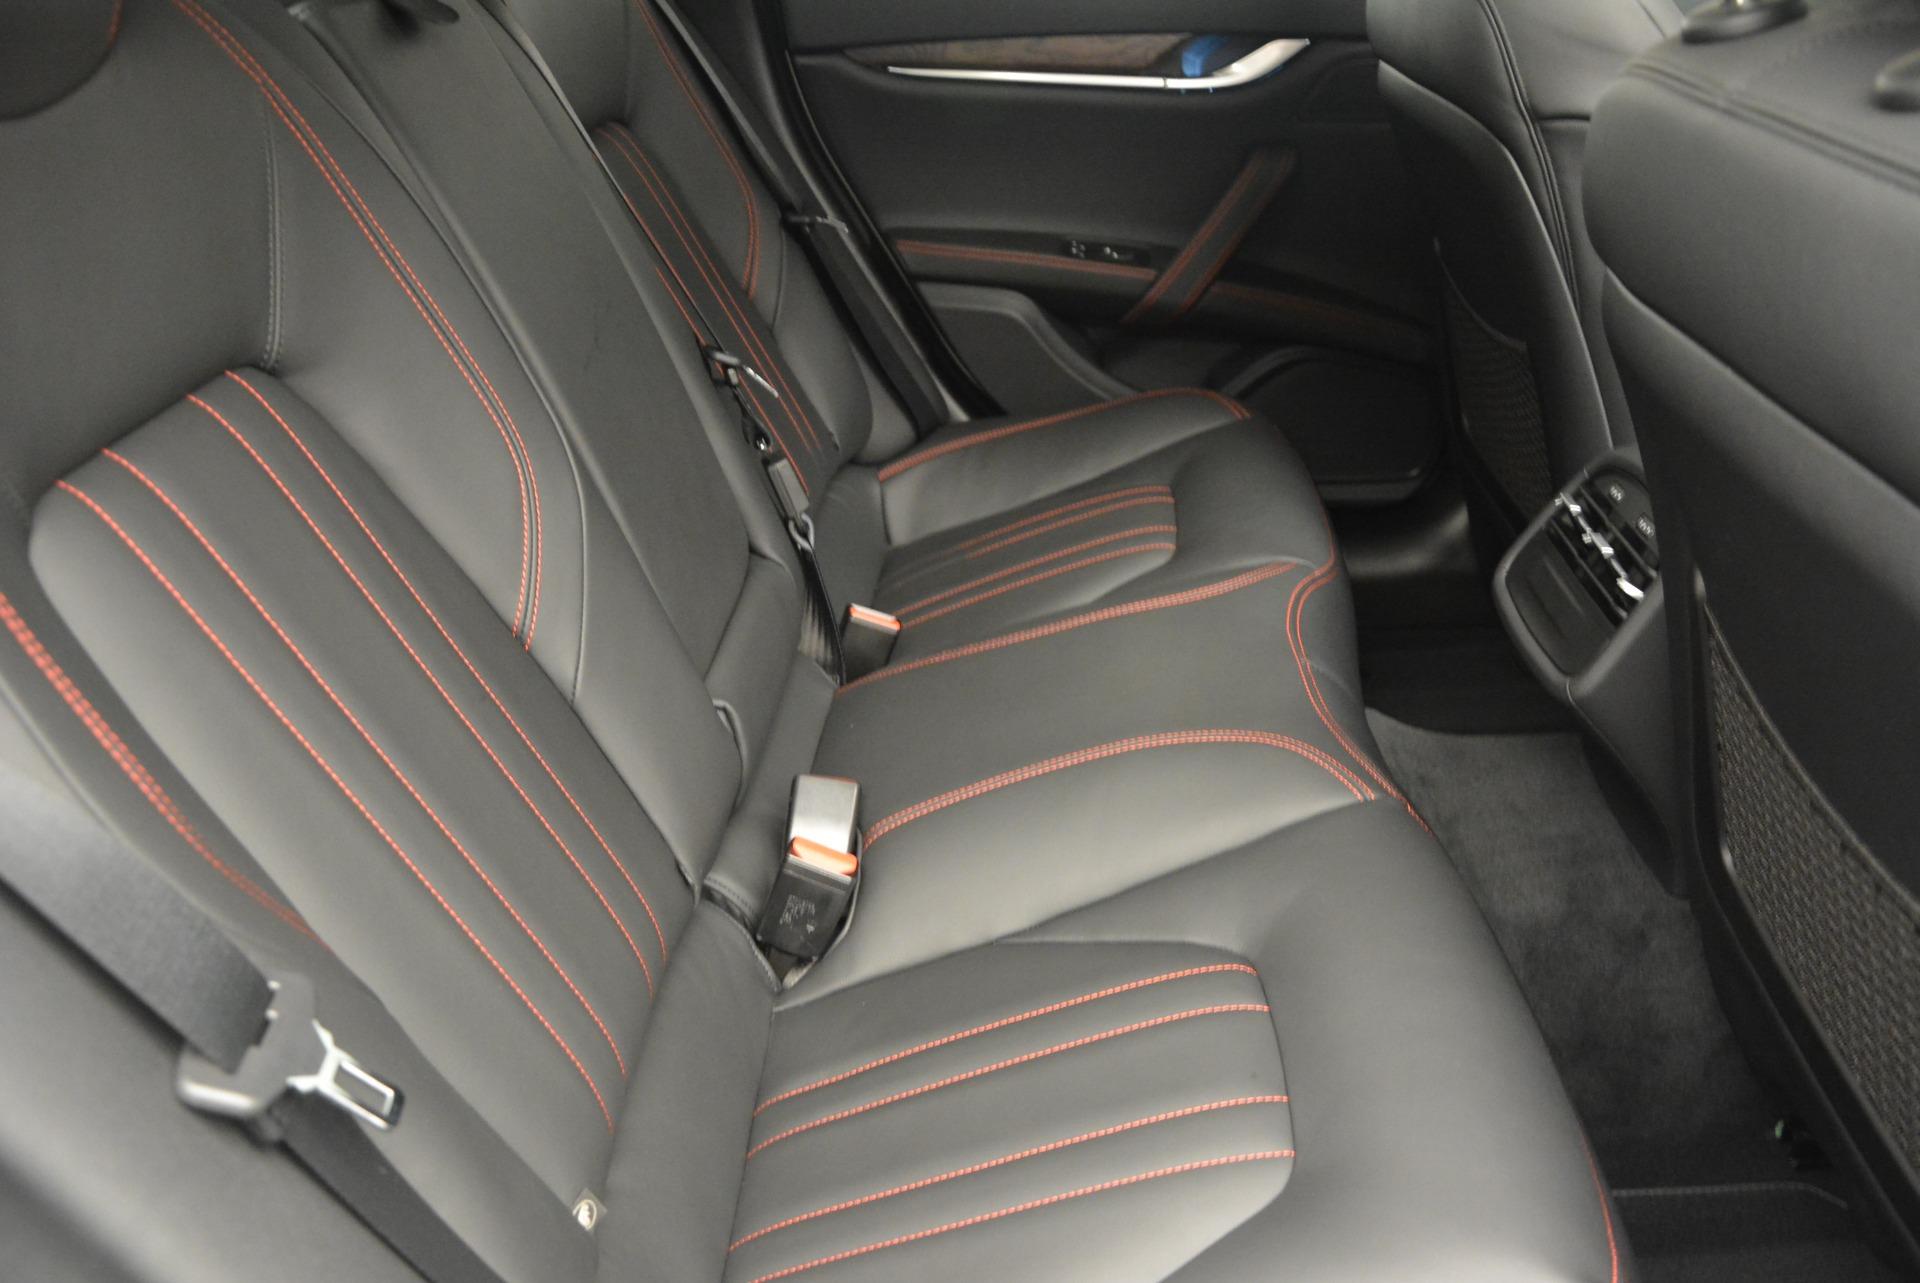 Used 2015 Maserati Ghibli S Q4 For Sale In Greenwich, CT 2070_p21